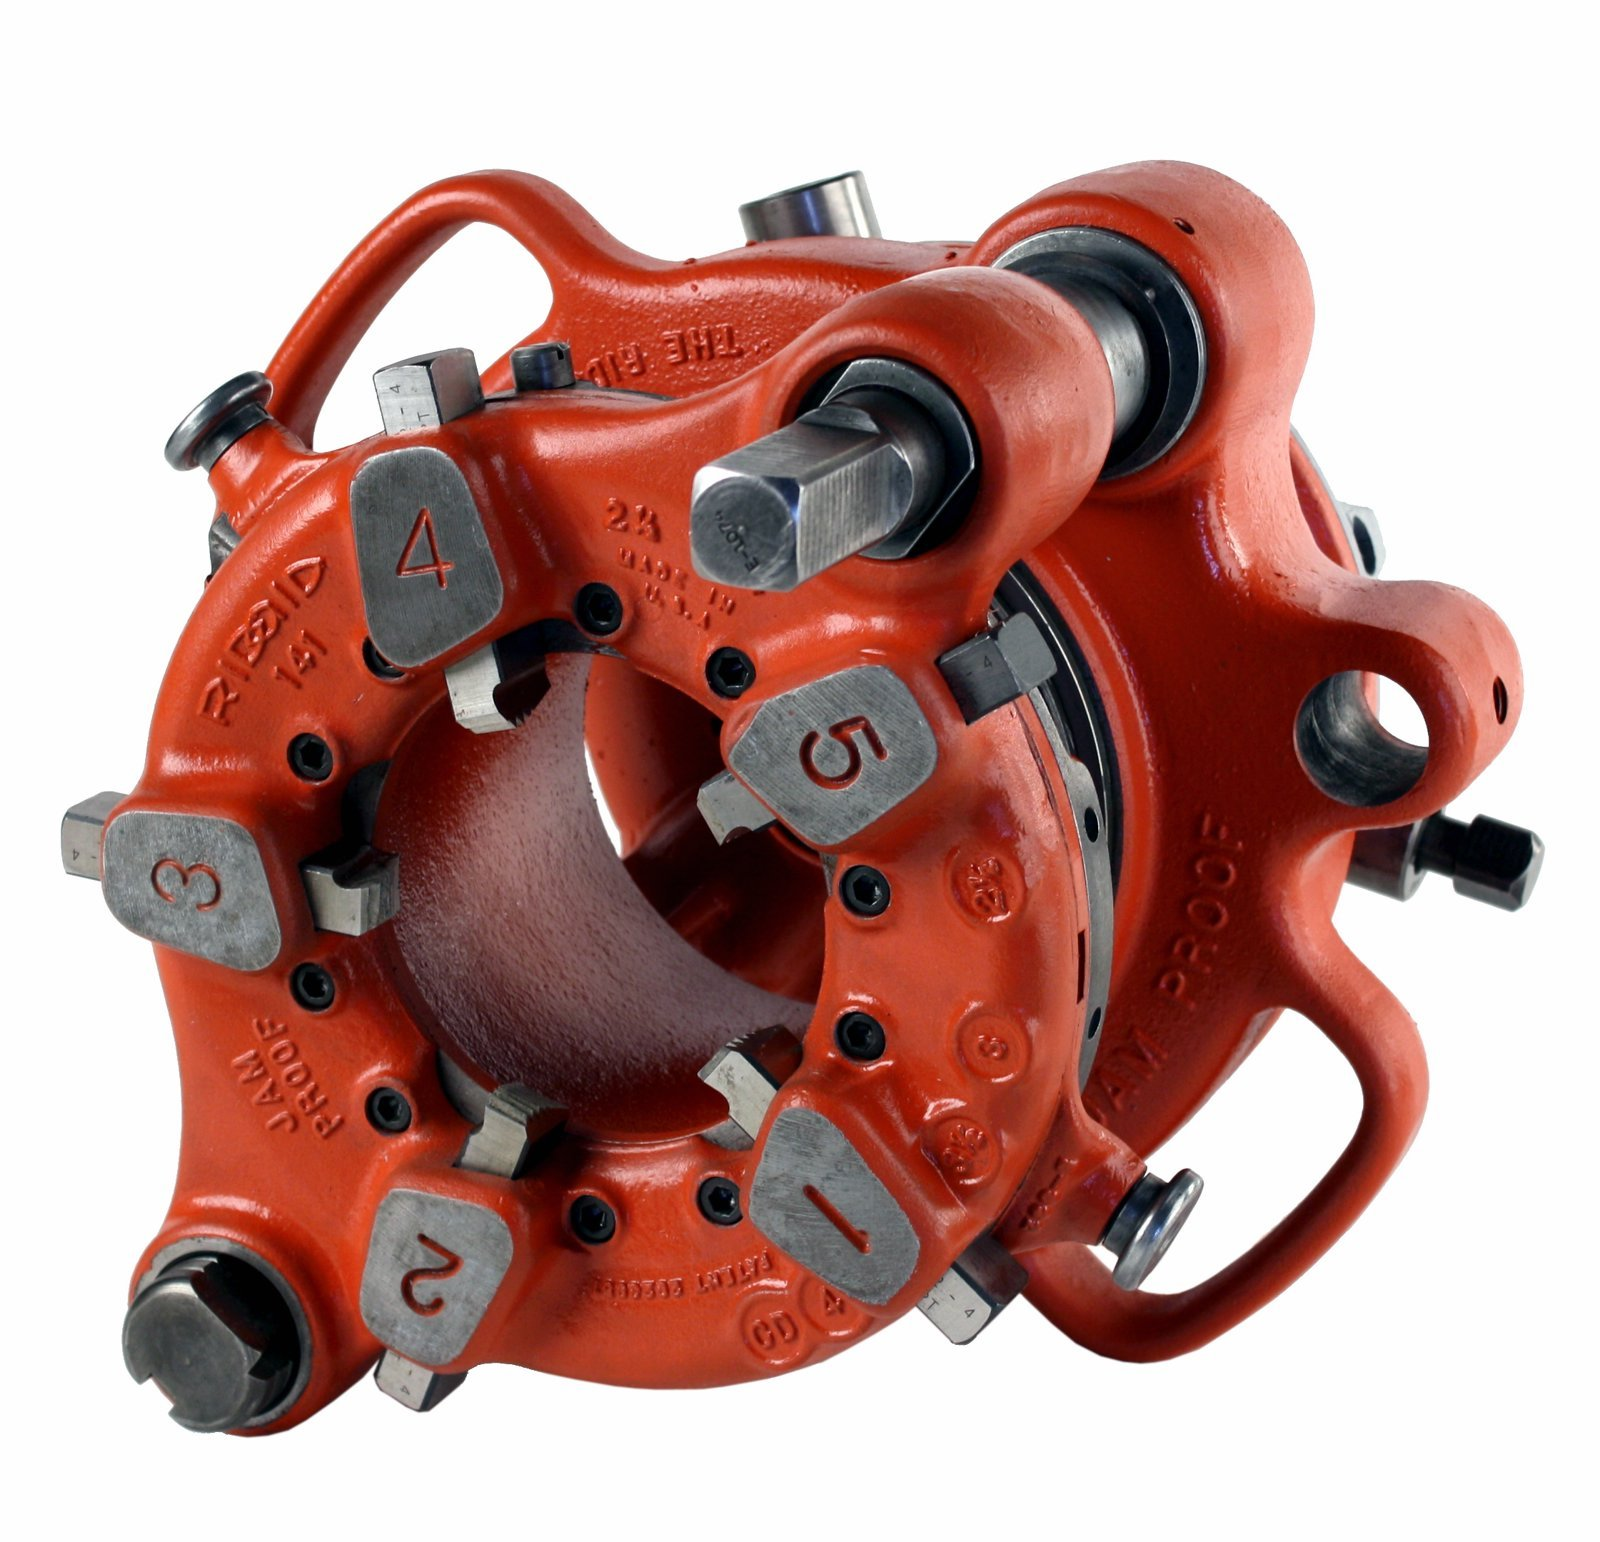 RIDGID 36620 141 Geared Pipe Threader Threading Machine (Renewed)